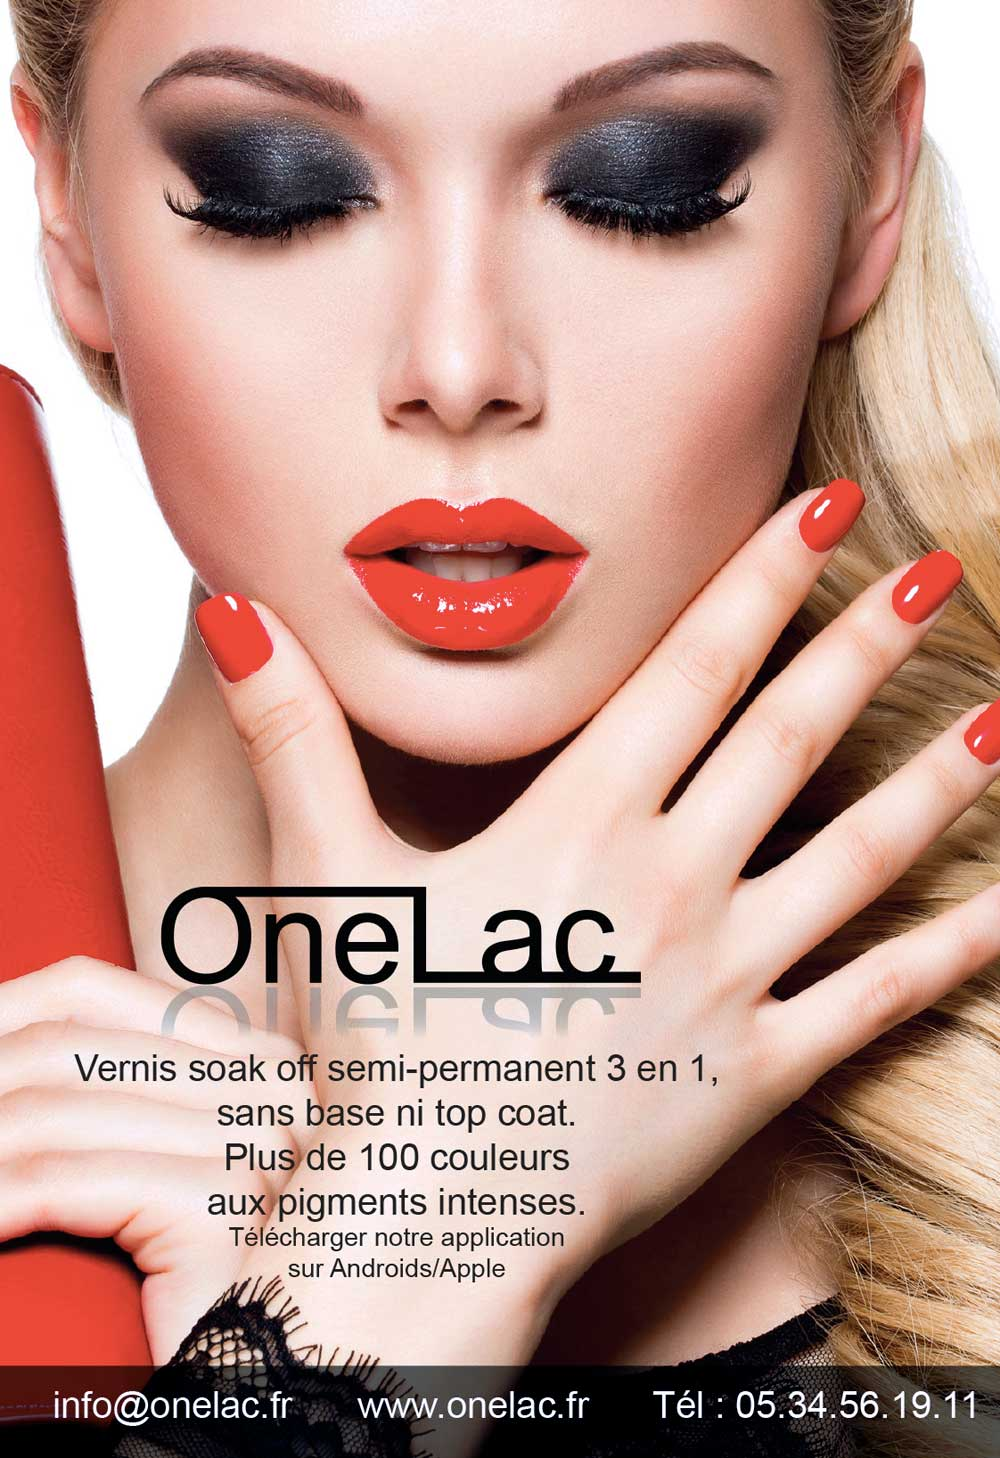 Onelac